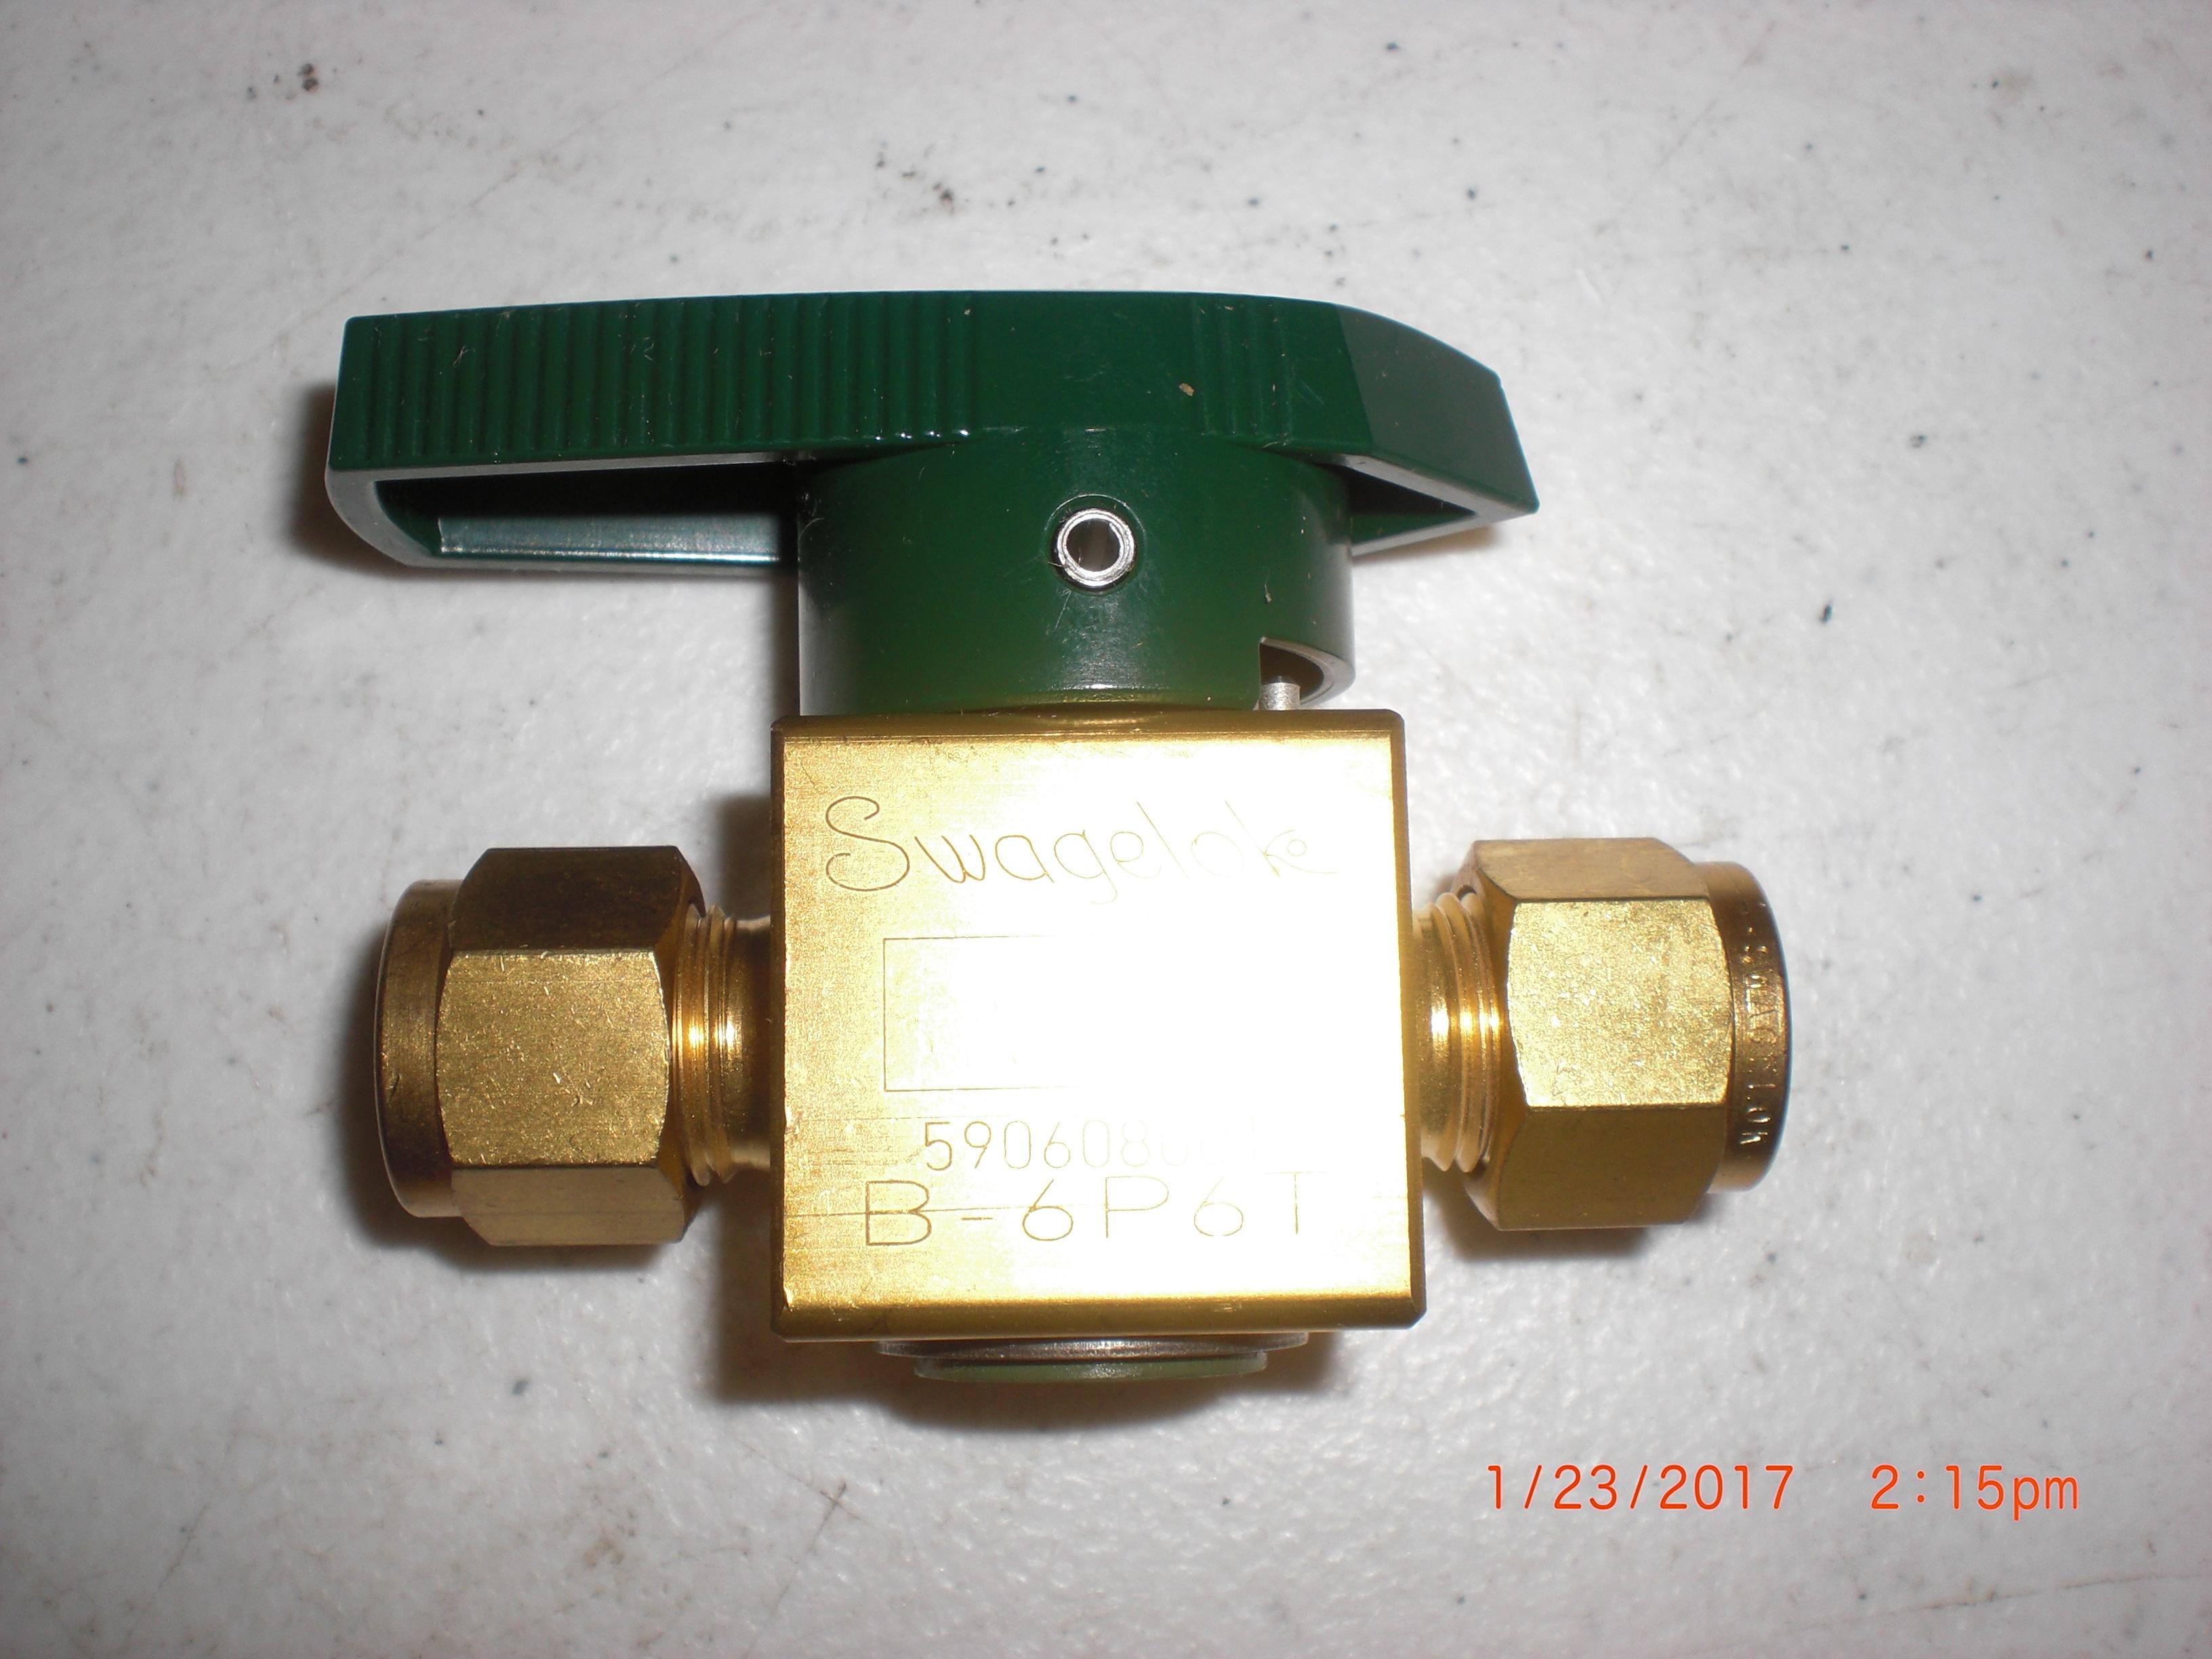 "Valve Swagelok B-6P6T Brass Plug Valve 3/8"" Tube"